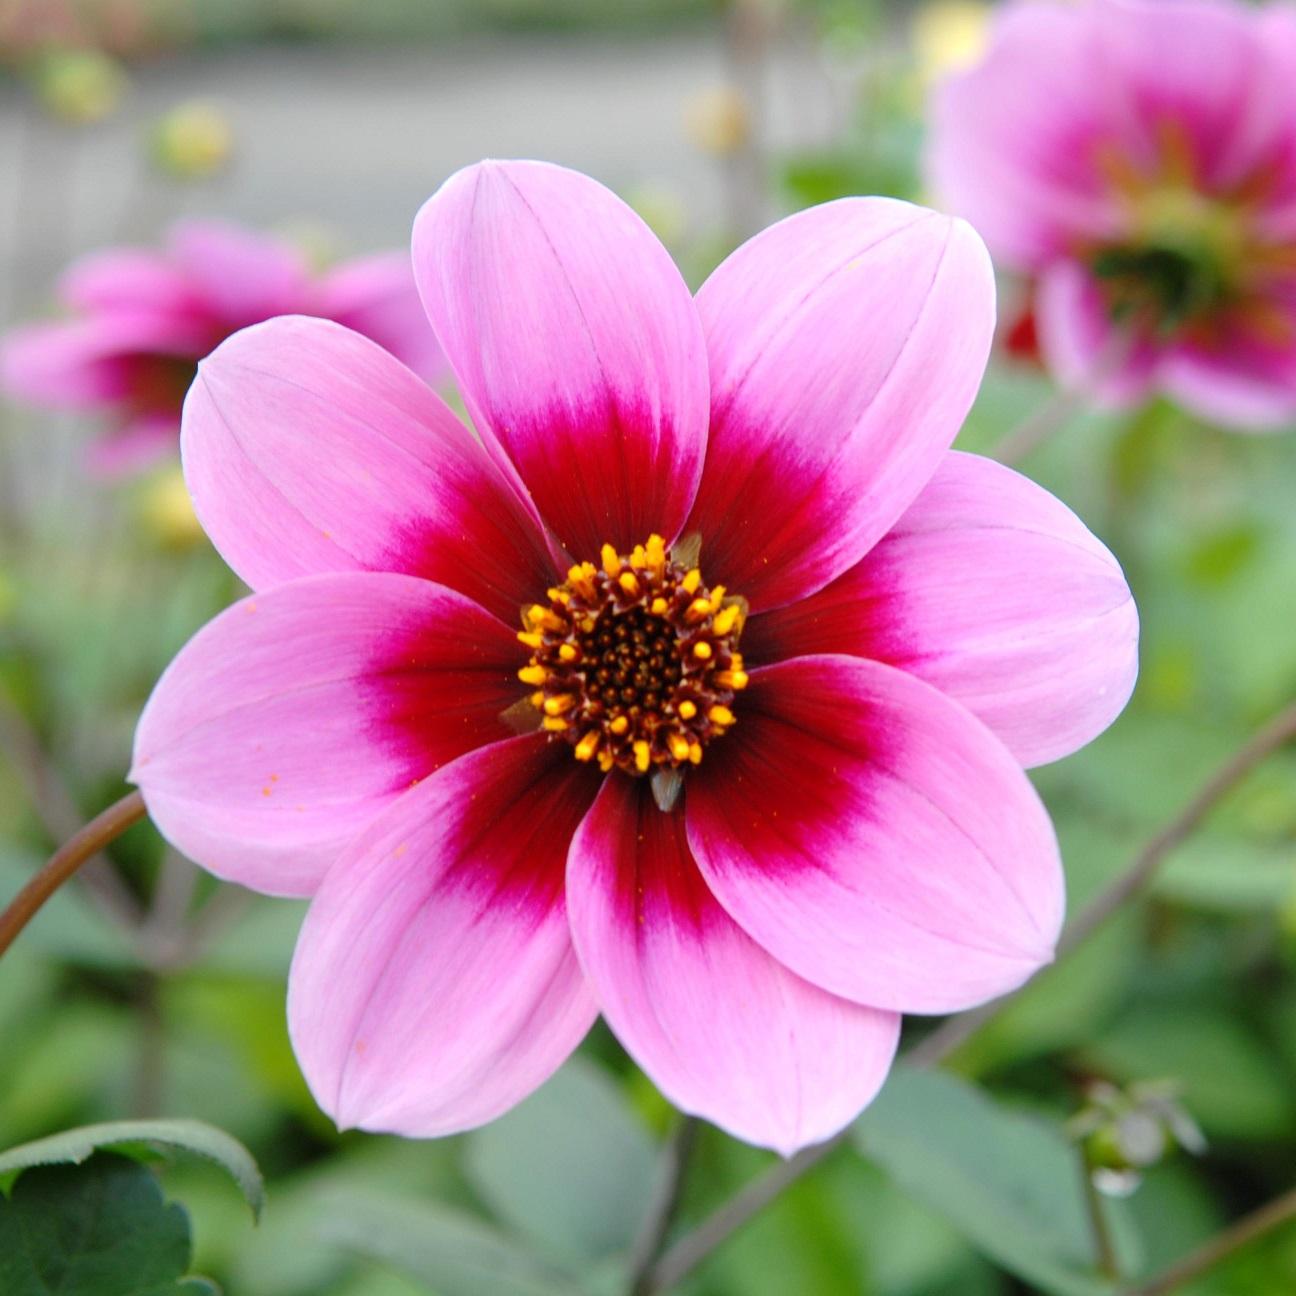 dahlia a fleur simple